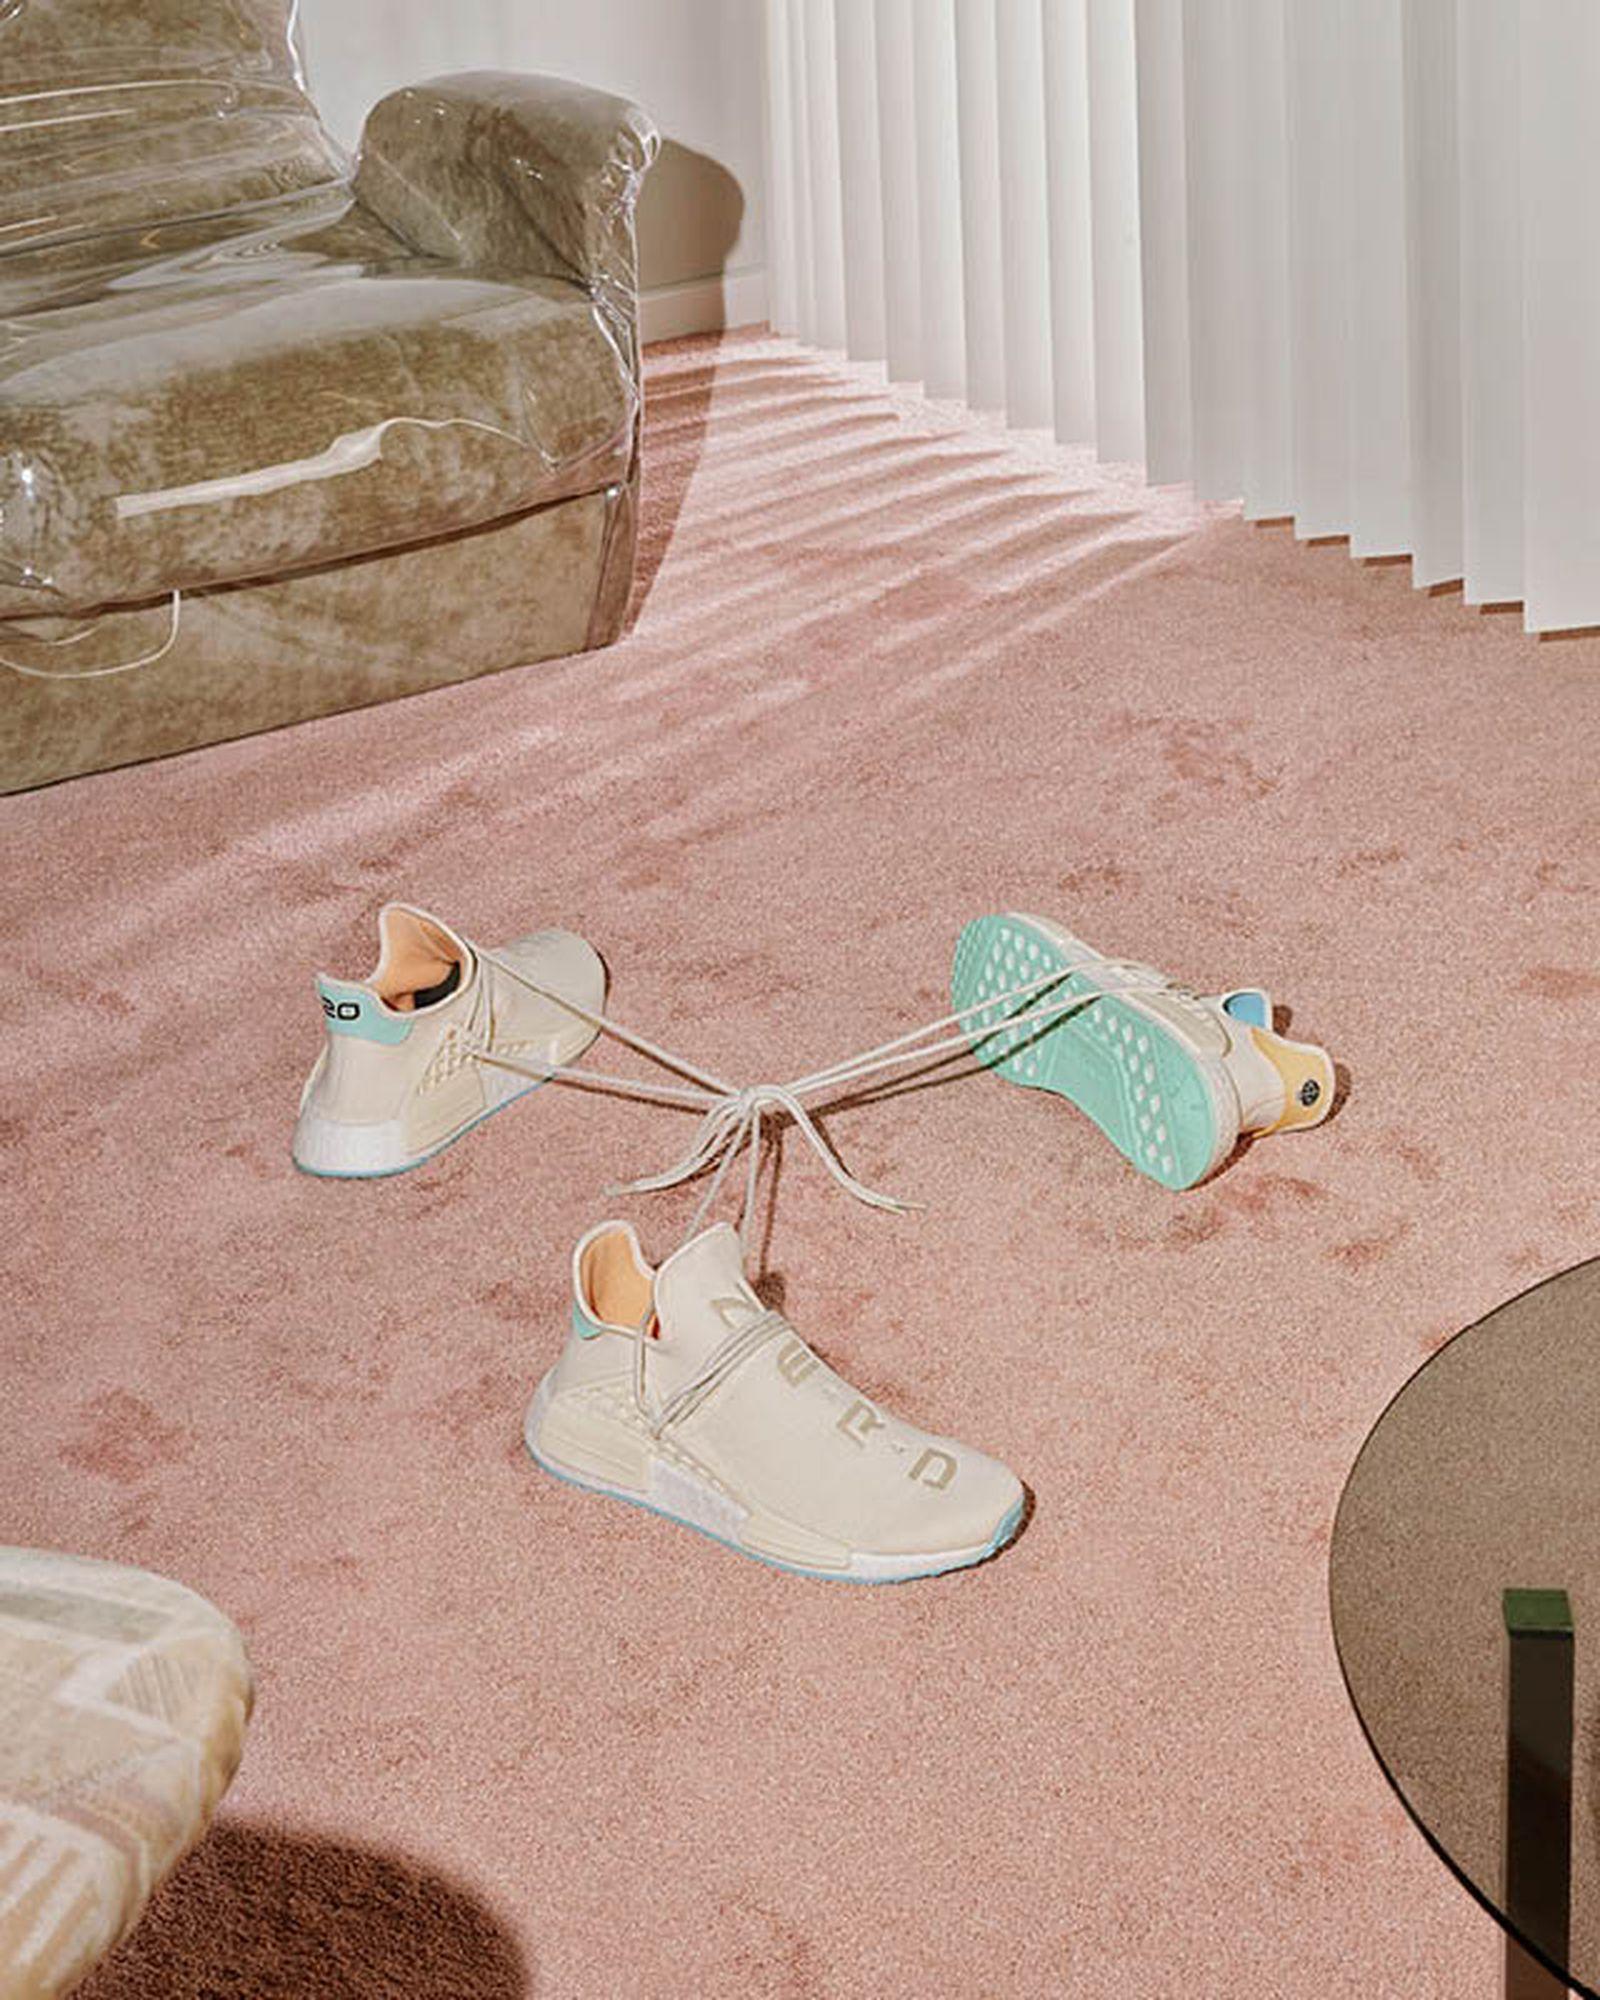 nerd-adidas-nmd-hu-release-date-price-07